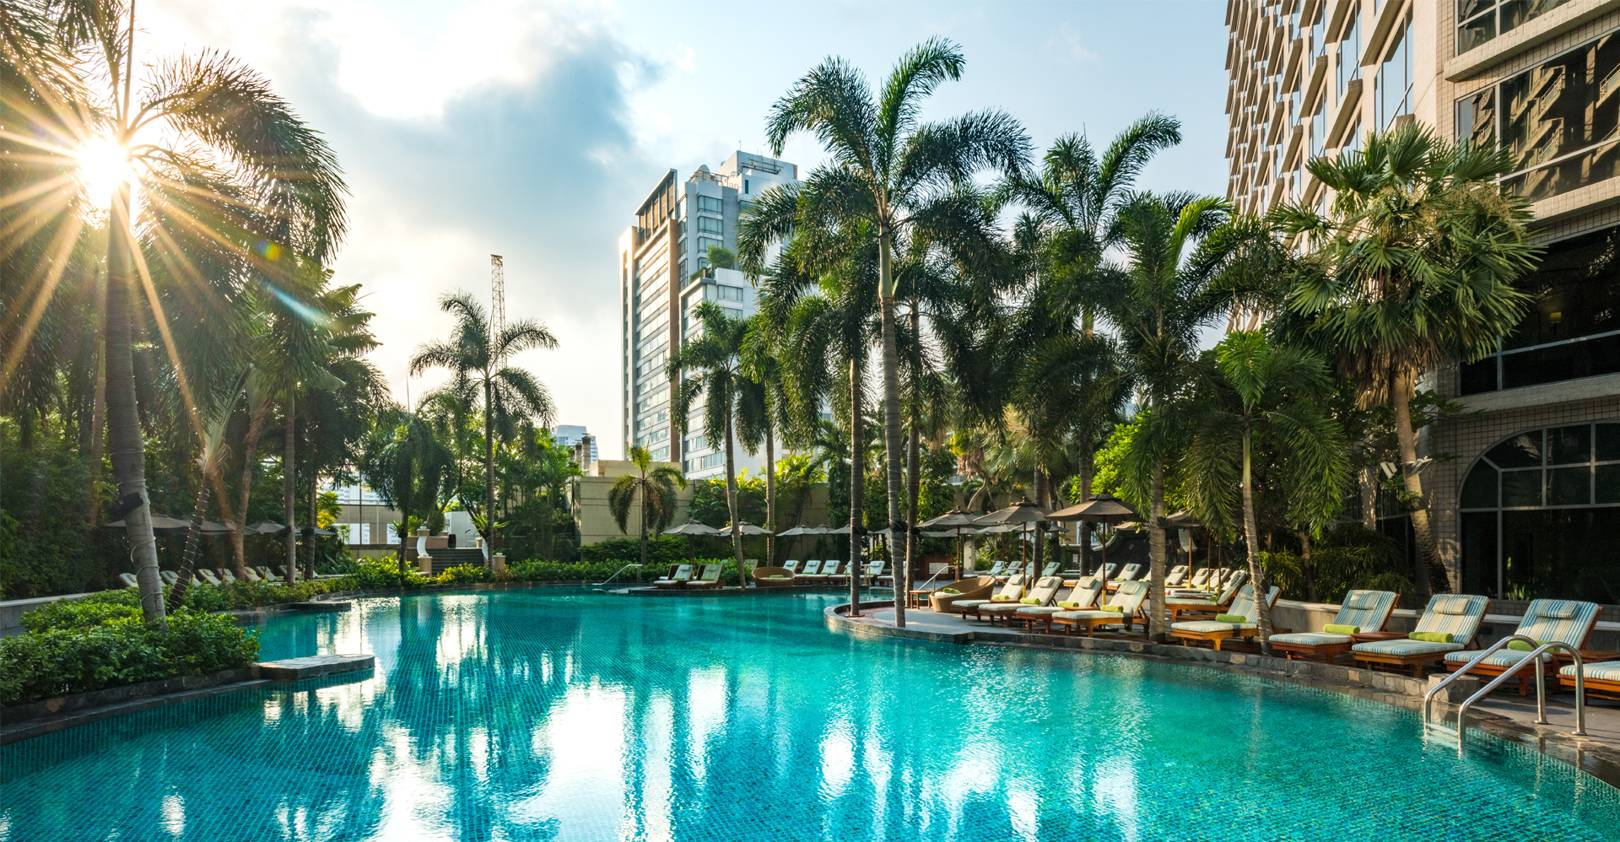 10 amazing things to do in Bangkok